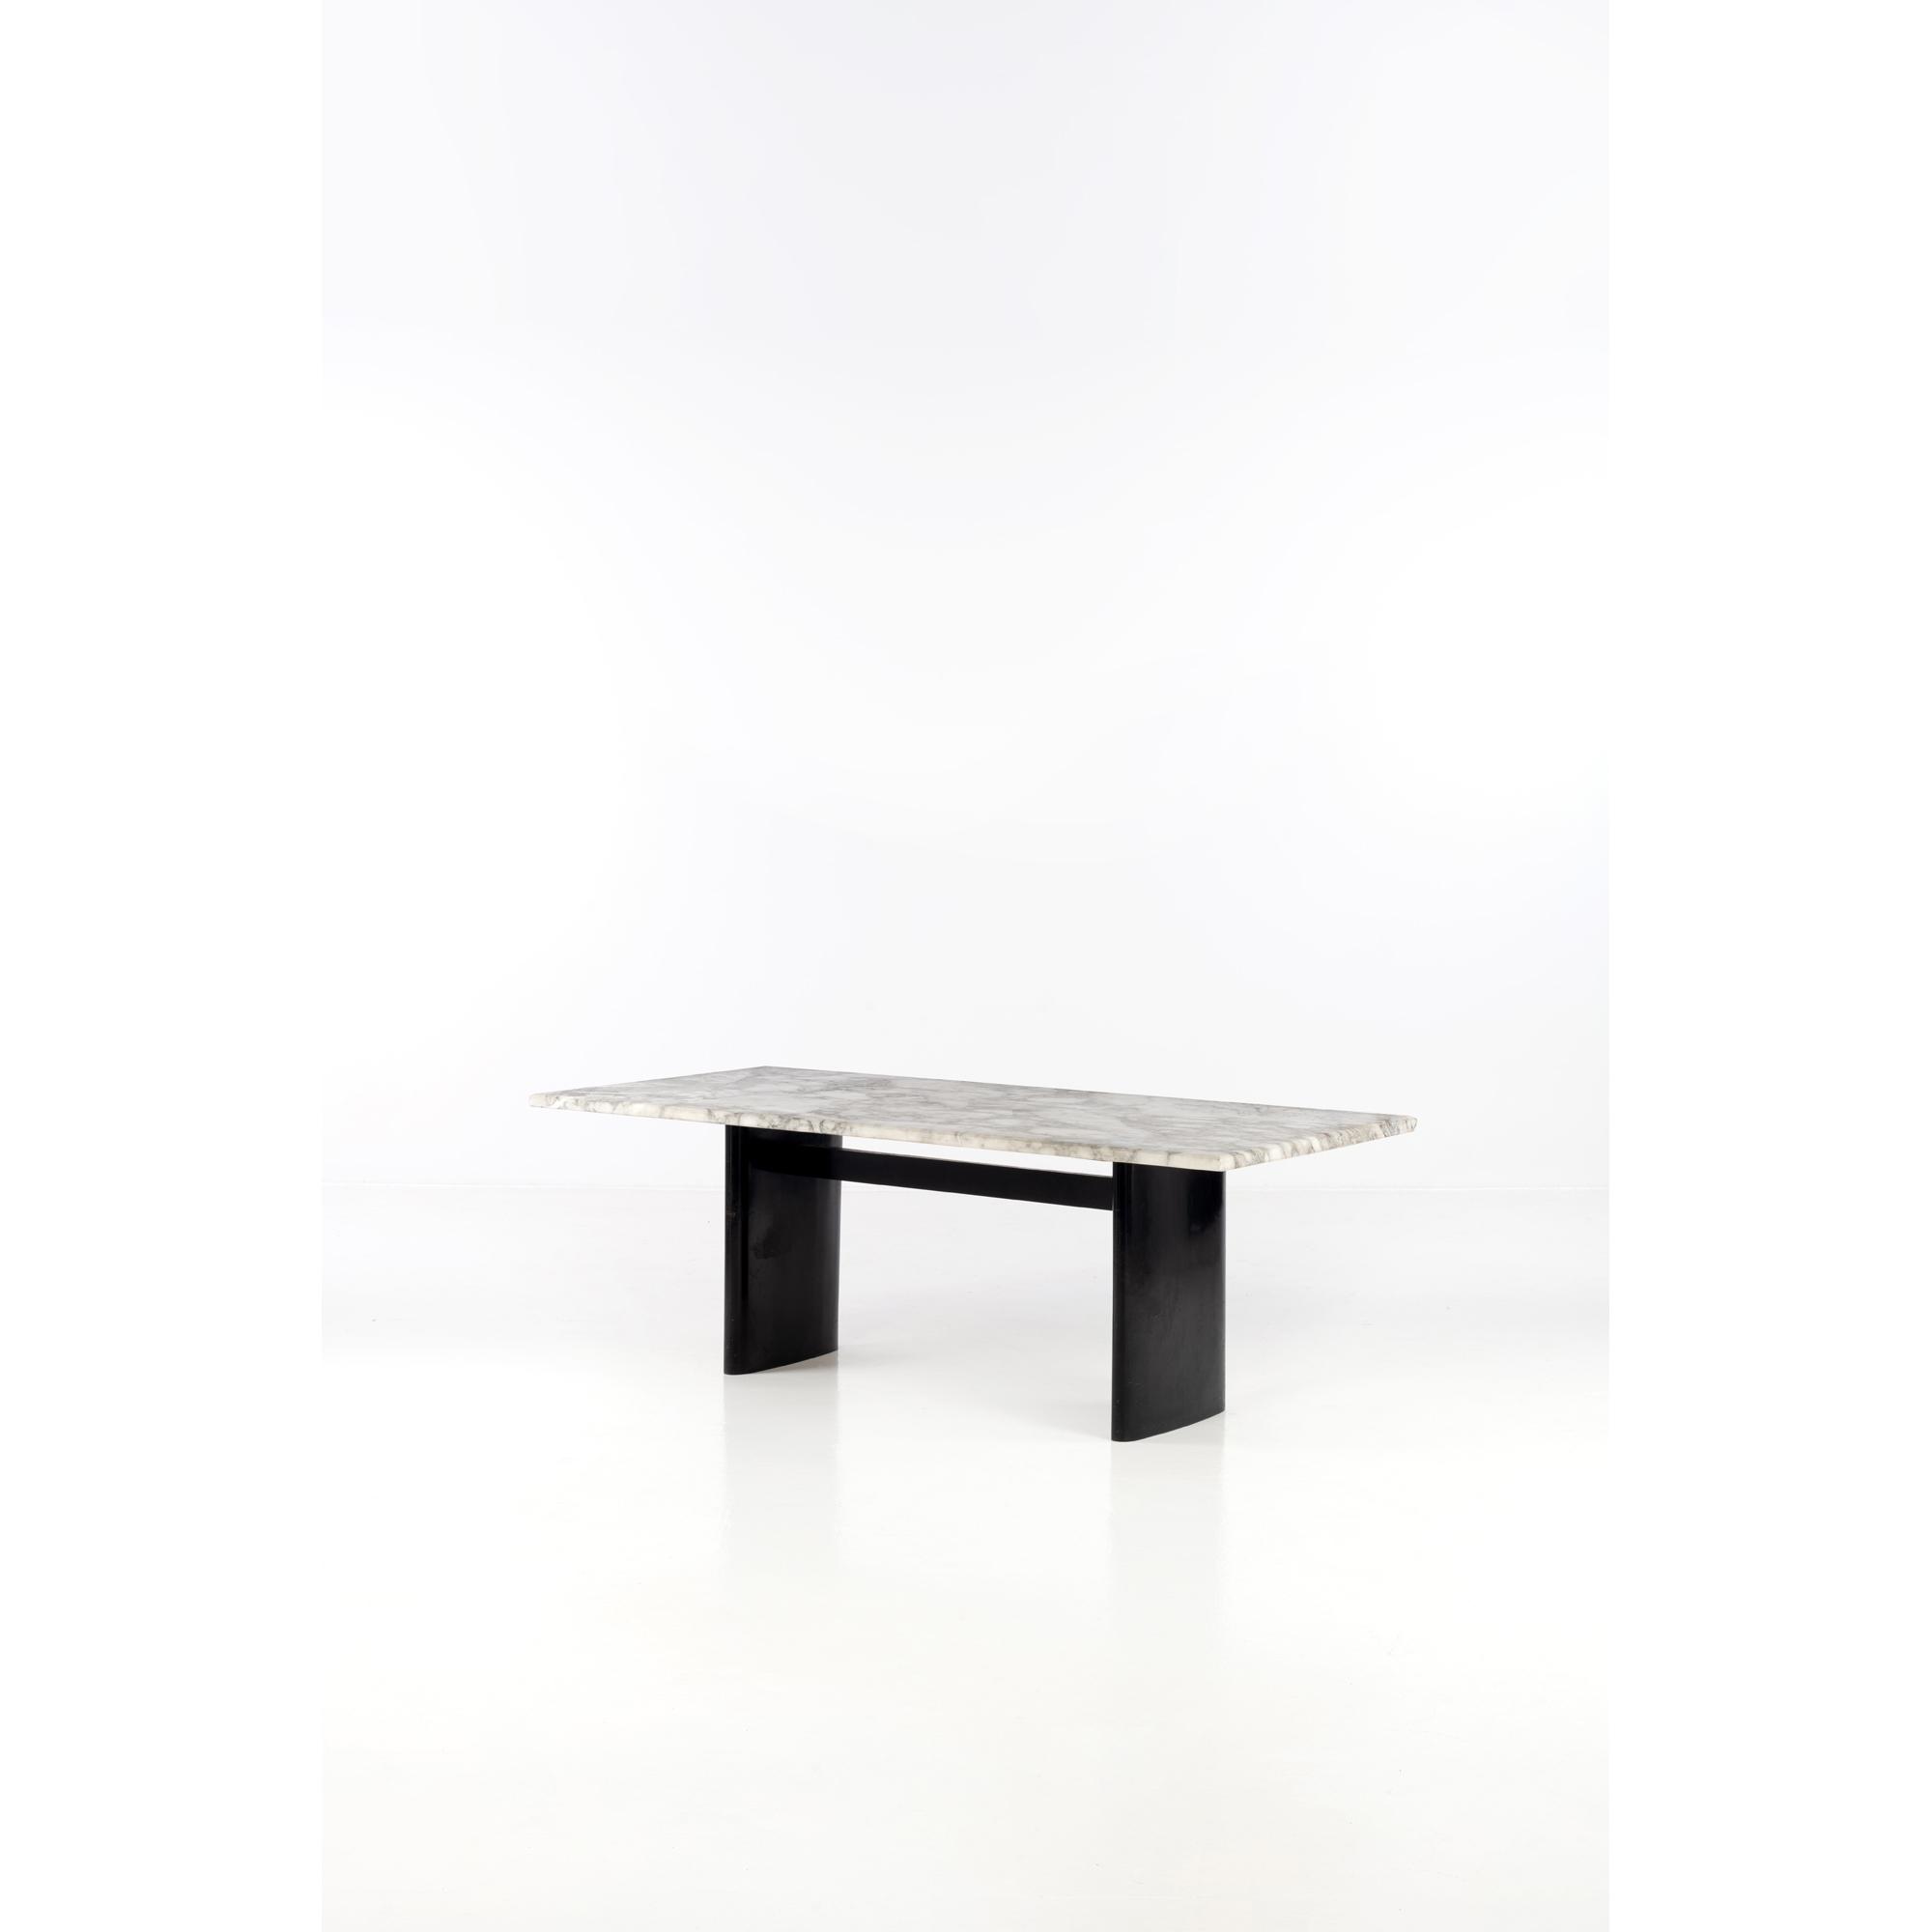 ƒ Joaquim Tenreiro (1906-1992) Table